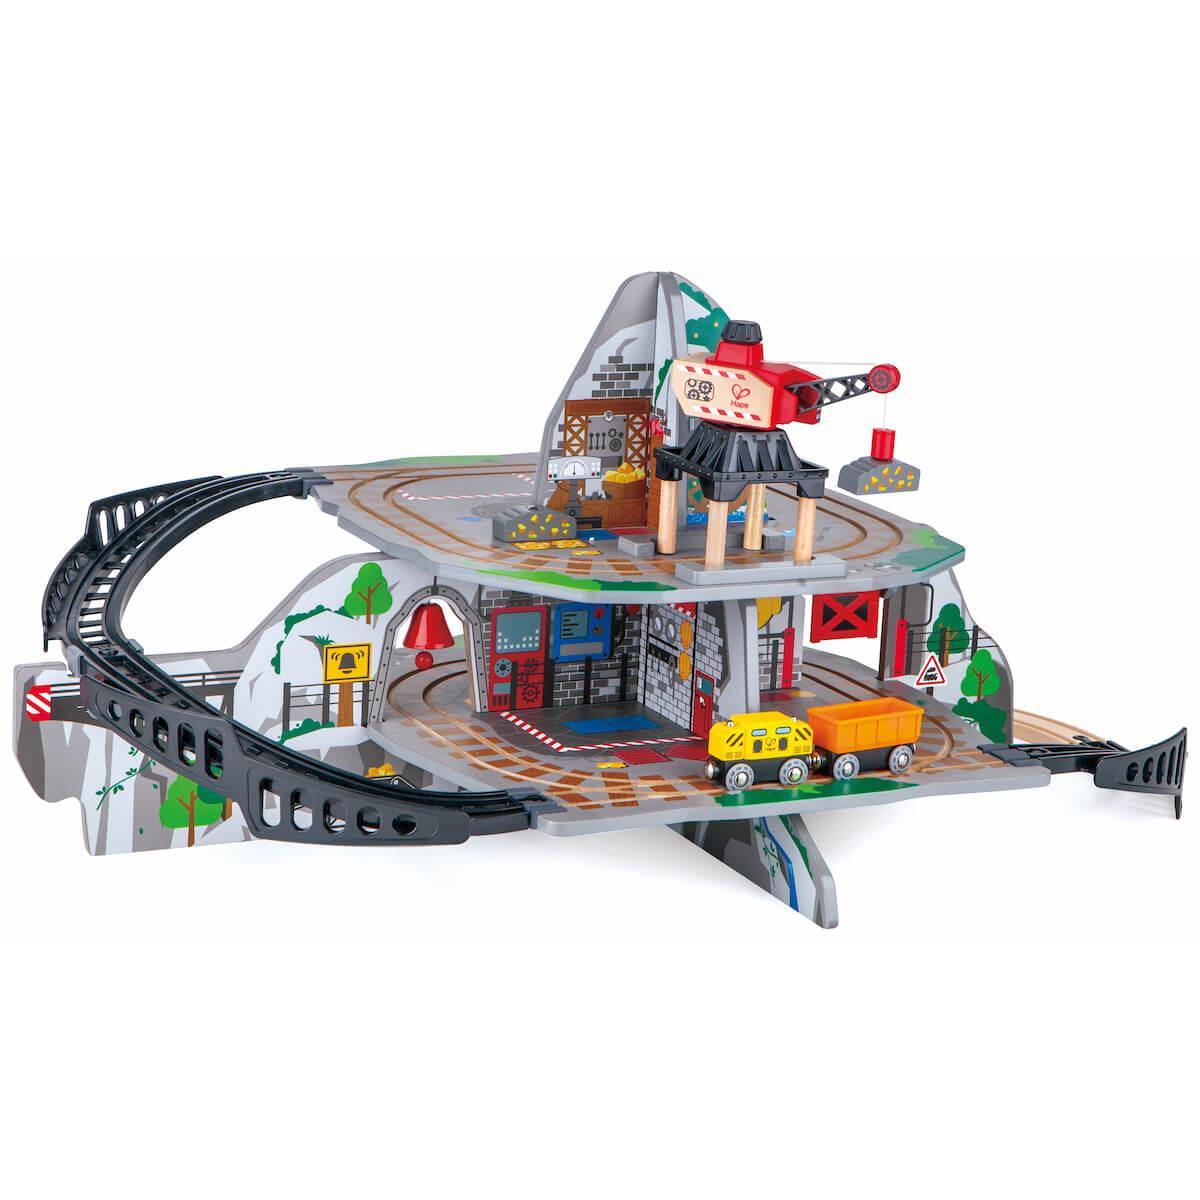 Circuit de train MASSIVE MOUNTAIN MINE Hape